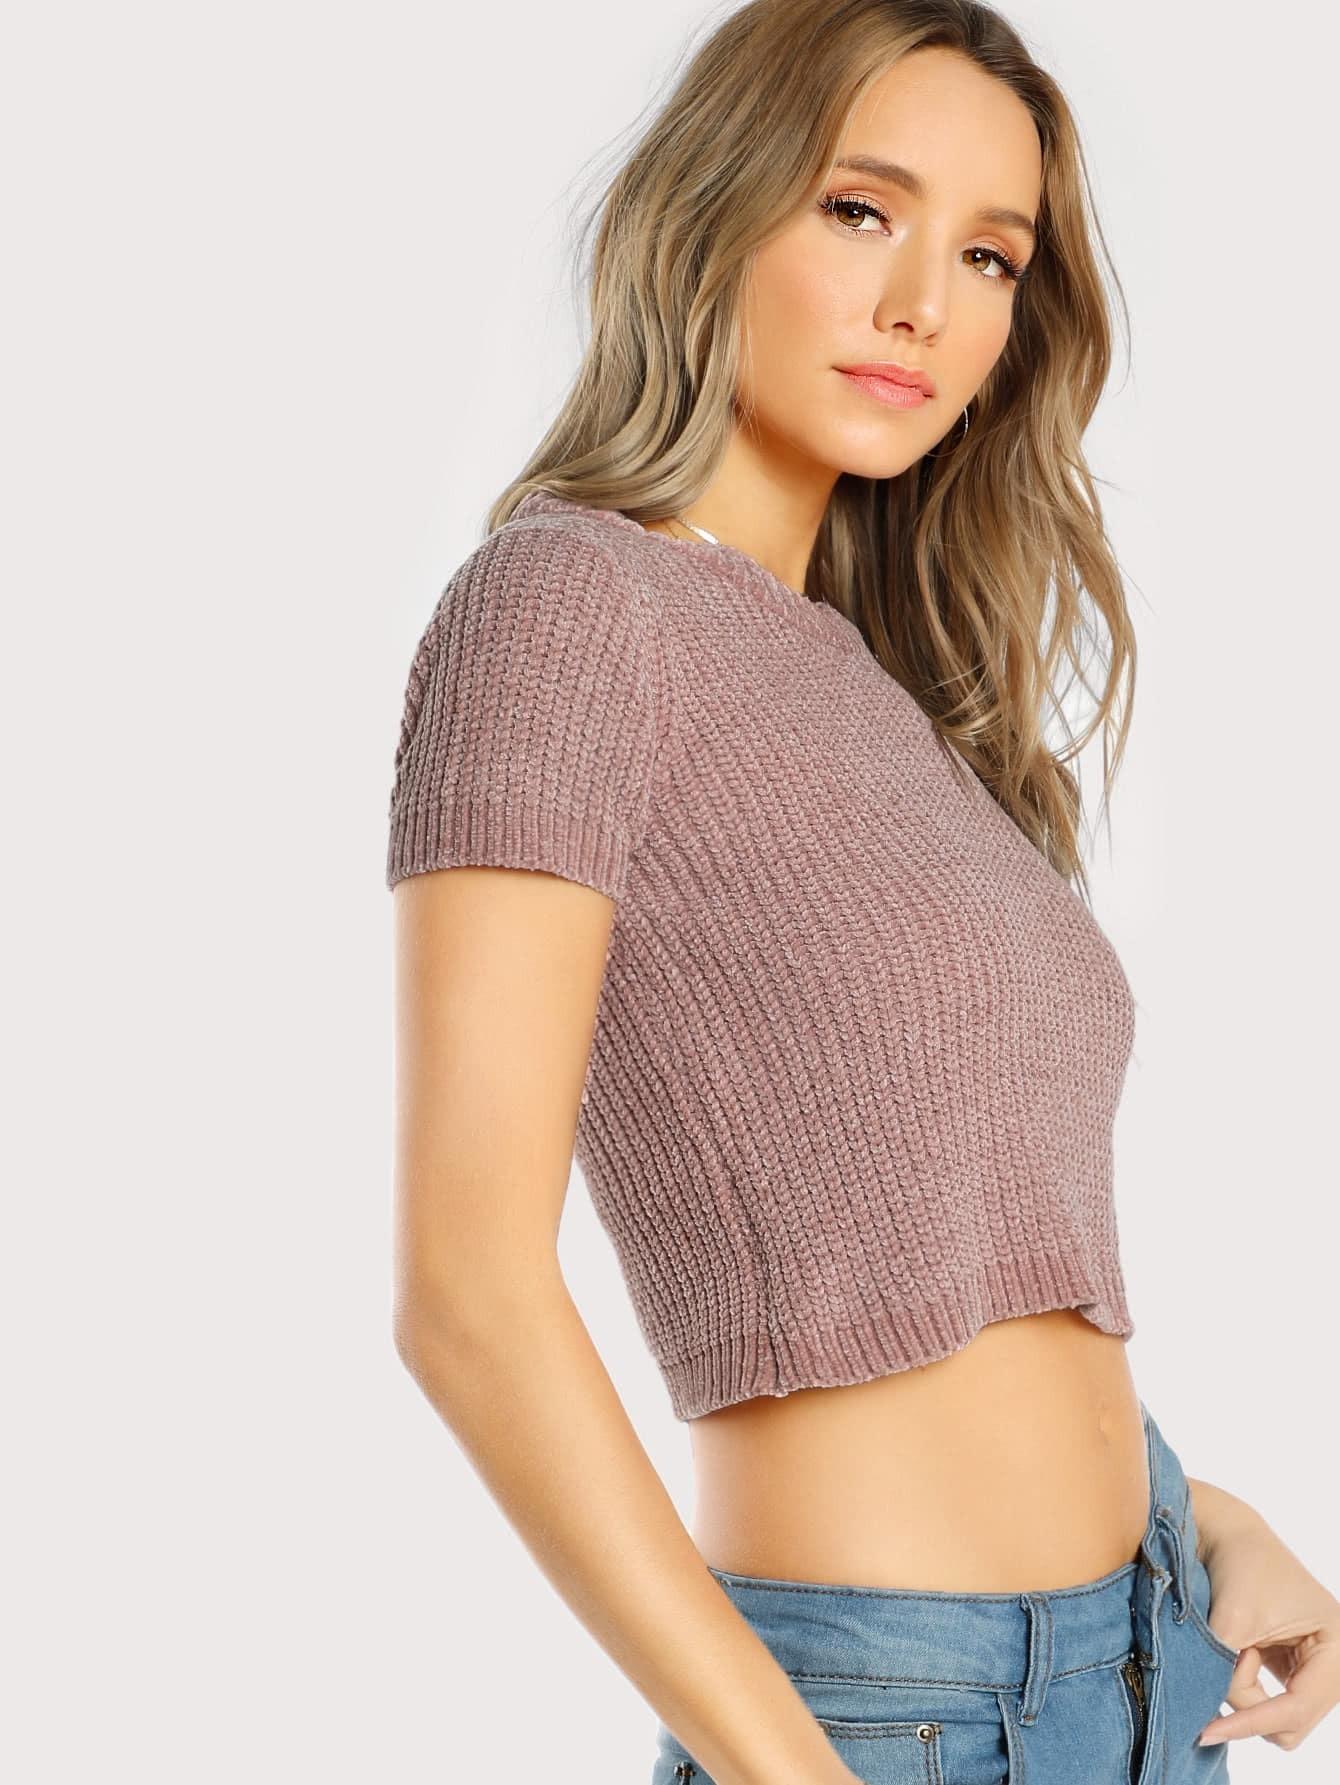 Short Sleeve Cropped Sweater ROSE -SheIn(Sheinside)